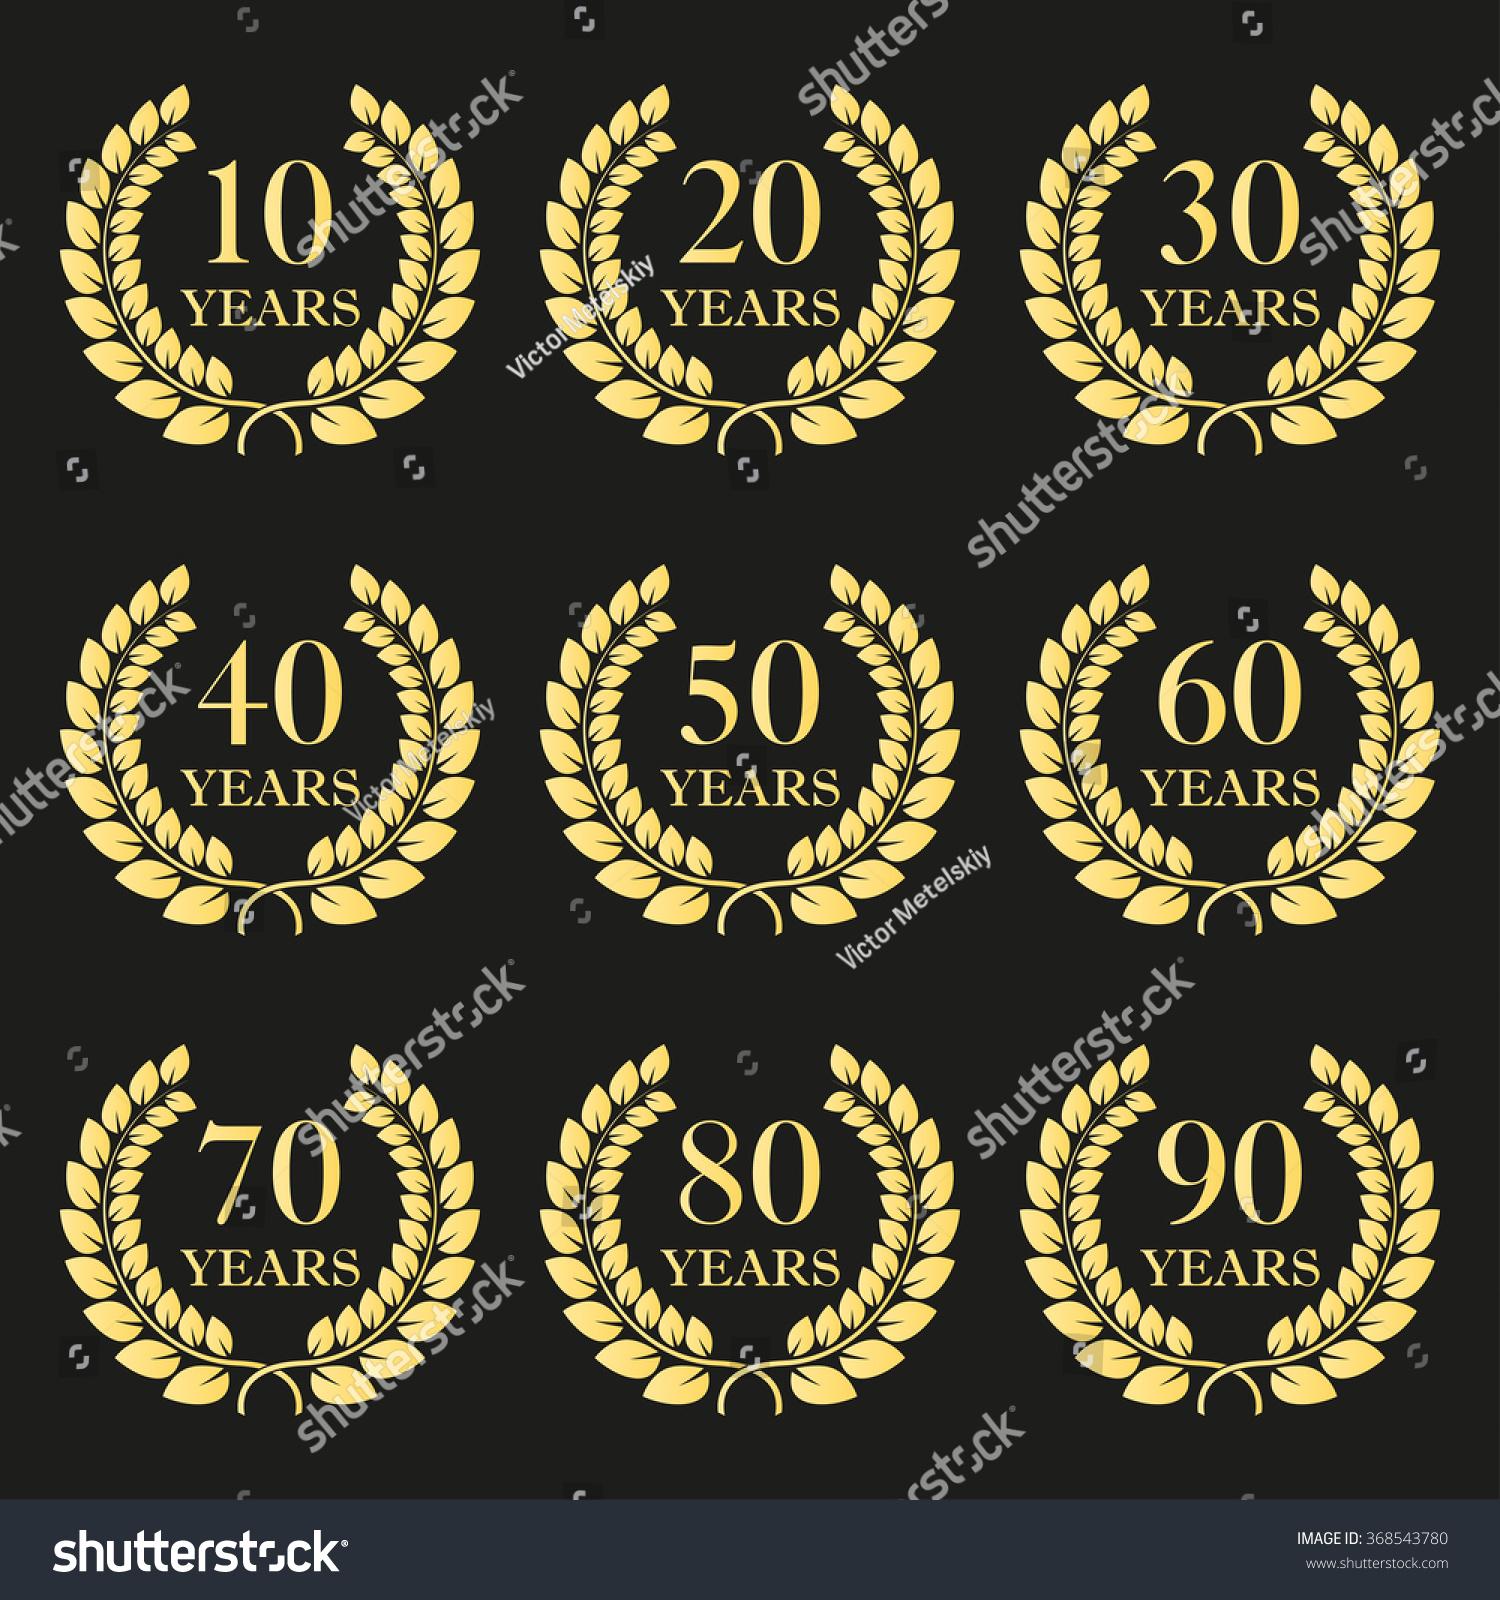 30 Year Anniversary Symbol: Anniversary Laurel Wreath Icon Set Golden Stock